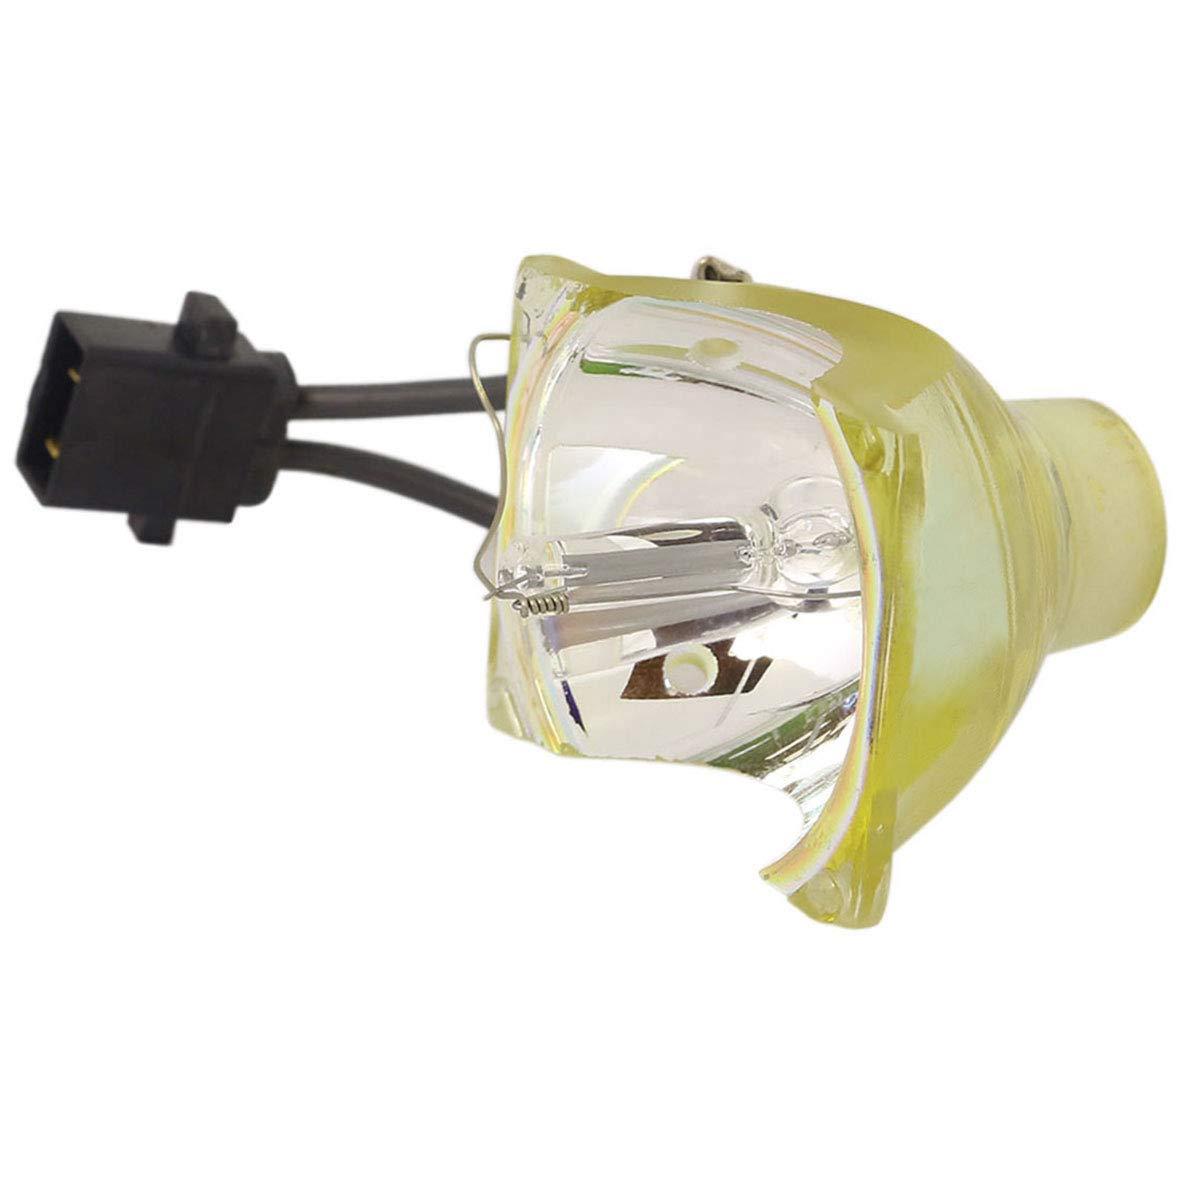 Lutema OEM プロジェクター交換用ランプ ハウジング/電球付き Epson EB 1776W用 Economy Economy Lamp Only B07KTJV42S